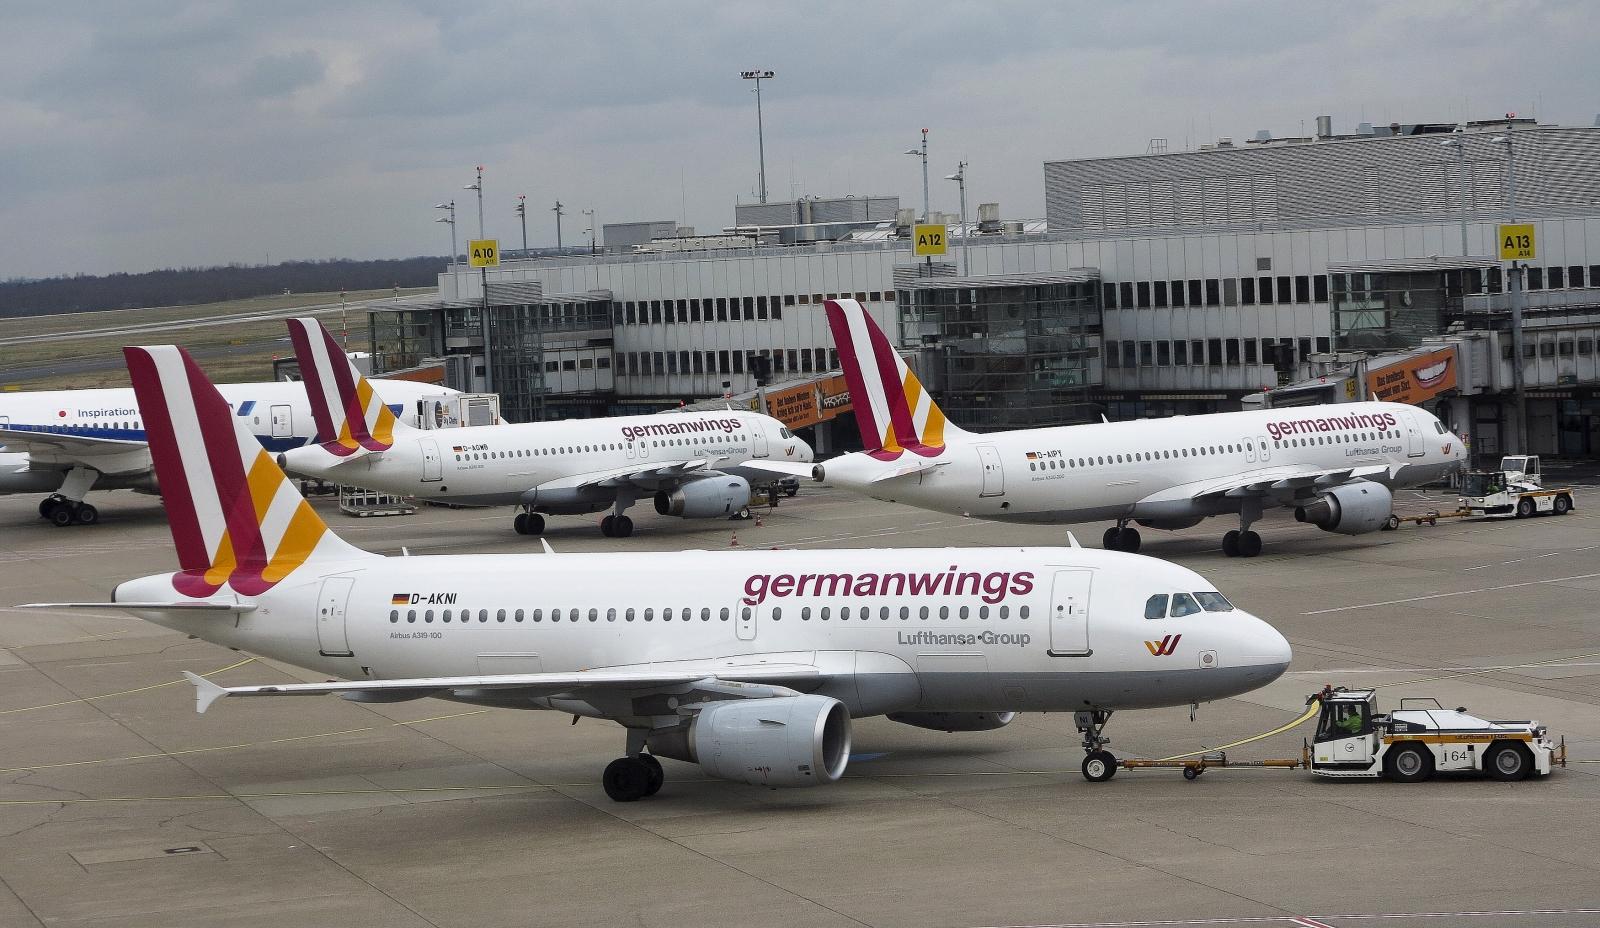 Germanwings plane crash and co-pilot Andreas Lubitz